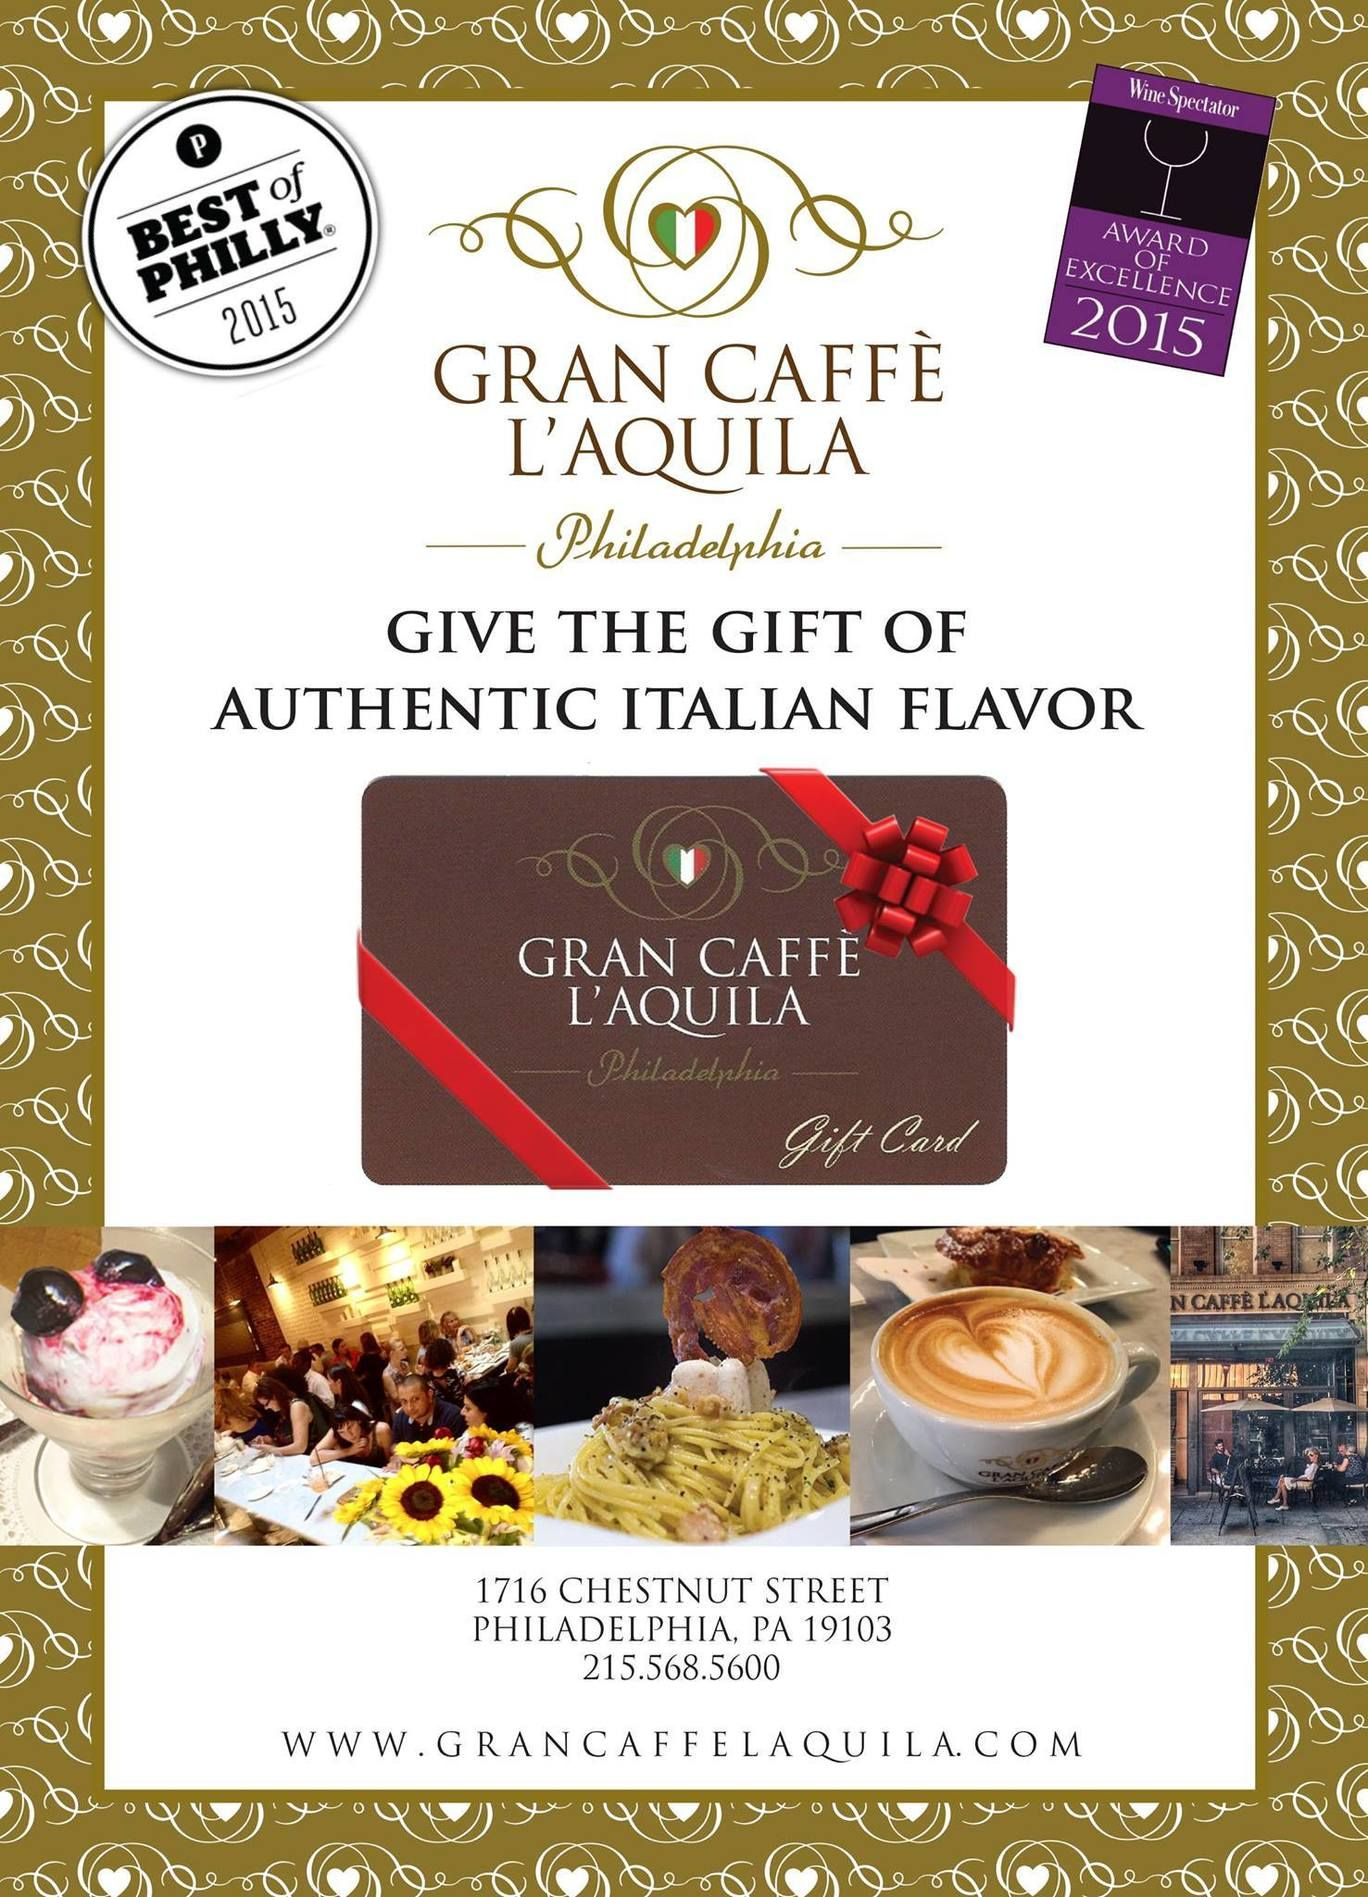 Its fridayitaliano at grancaffelaquila give the gift